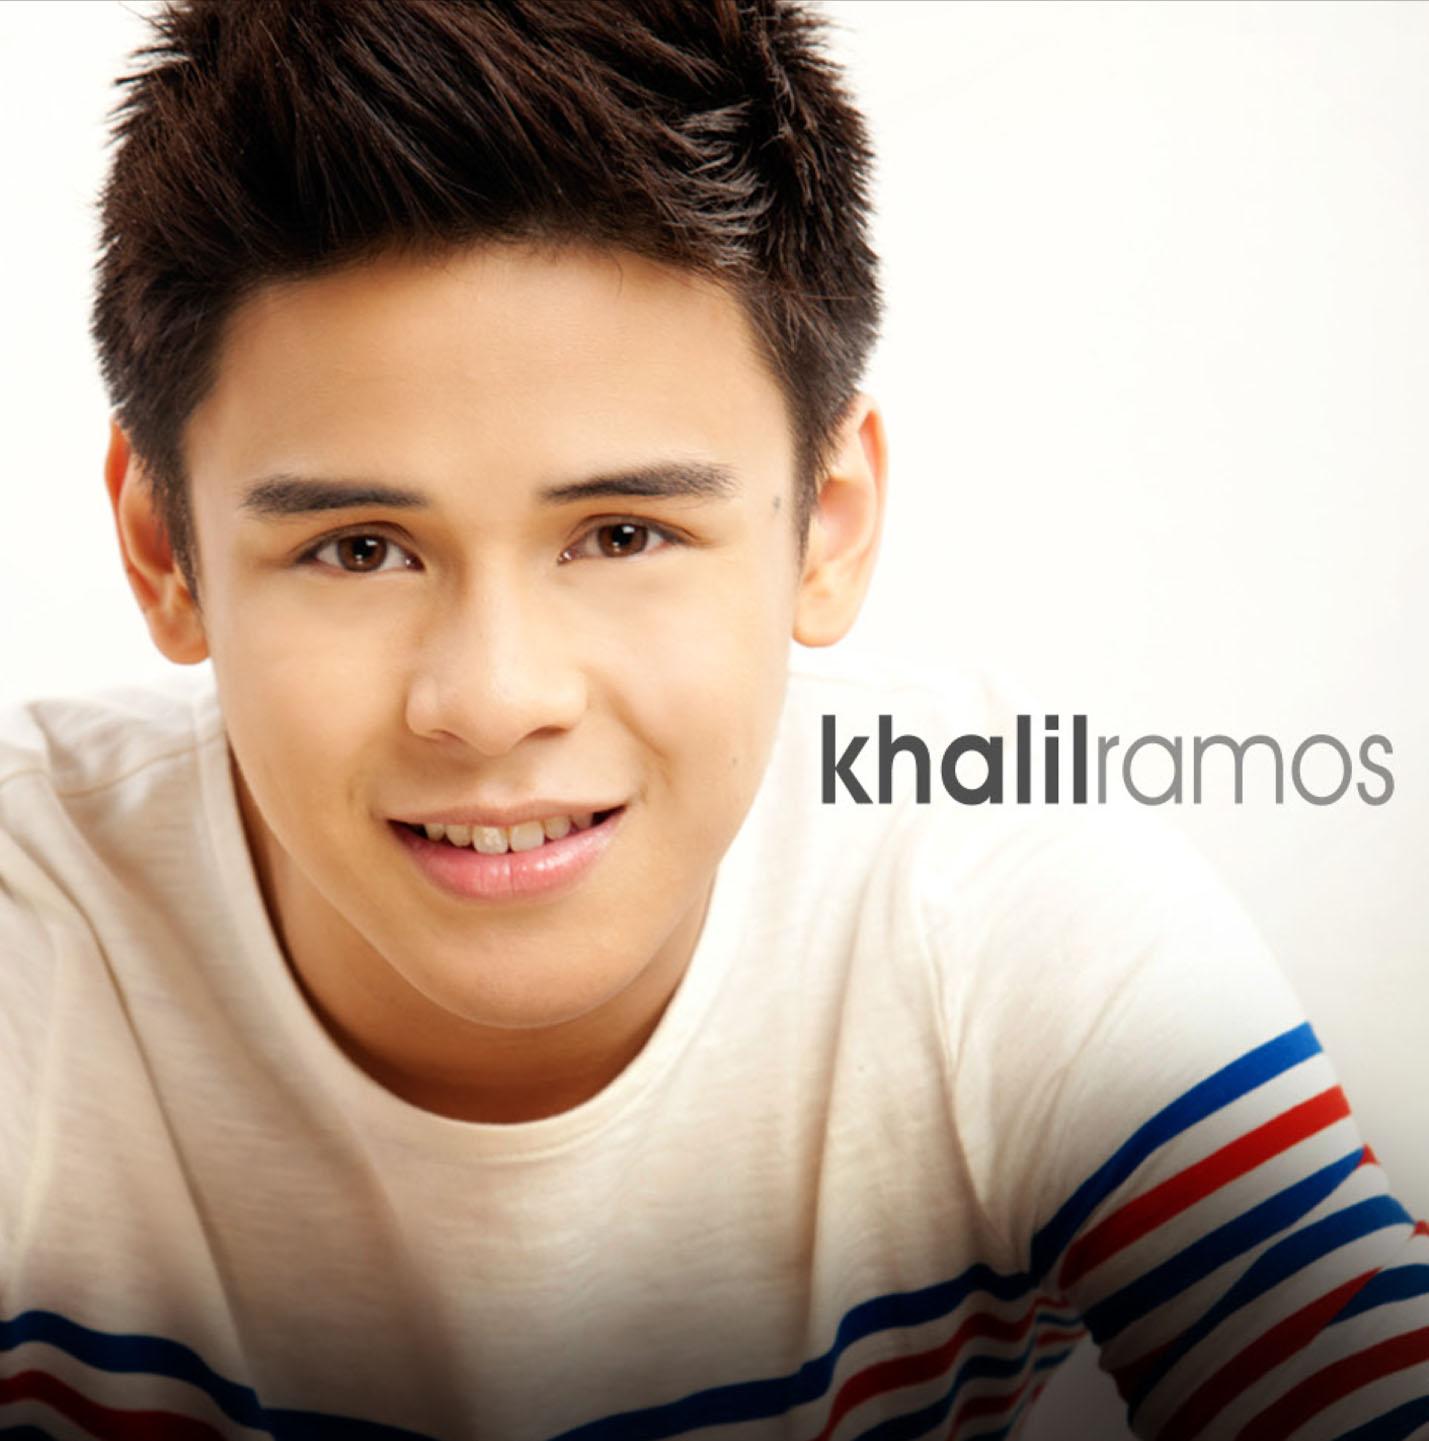 Singer Khalil Ramos - age: 21